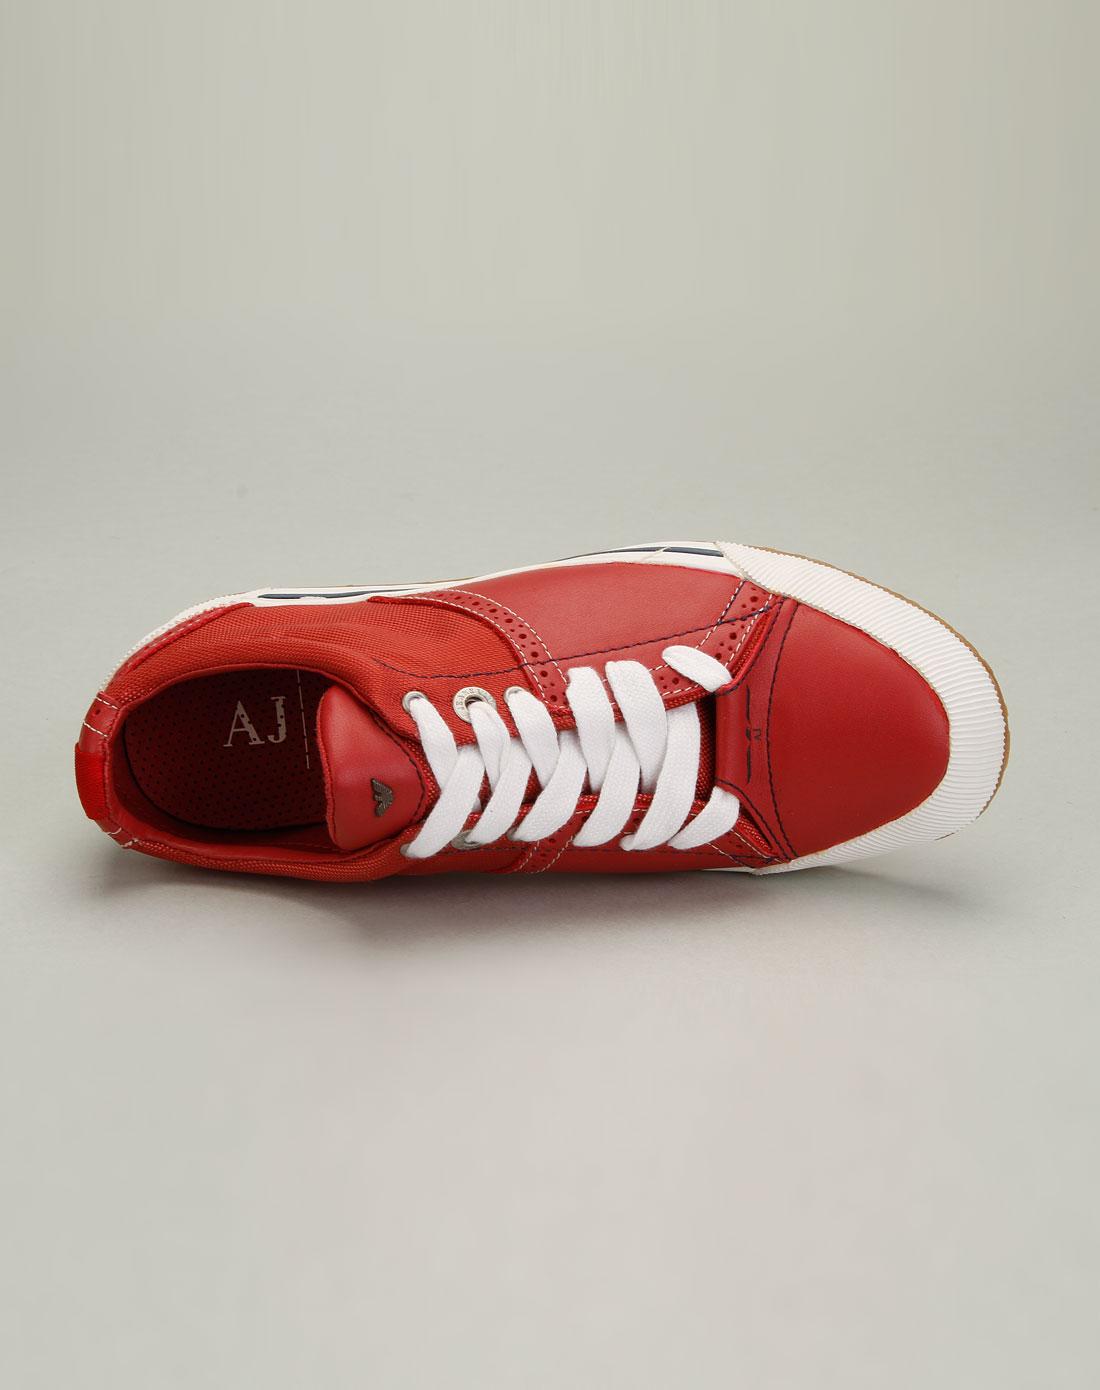 armani鞋子专场aj 男款经典百搭舒适拼料休闲鞋红色